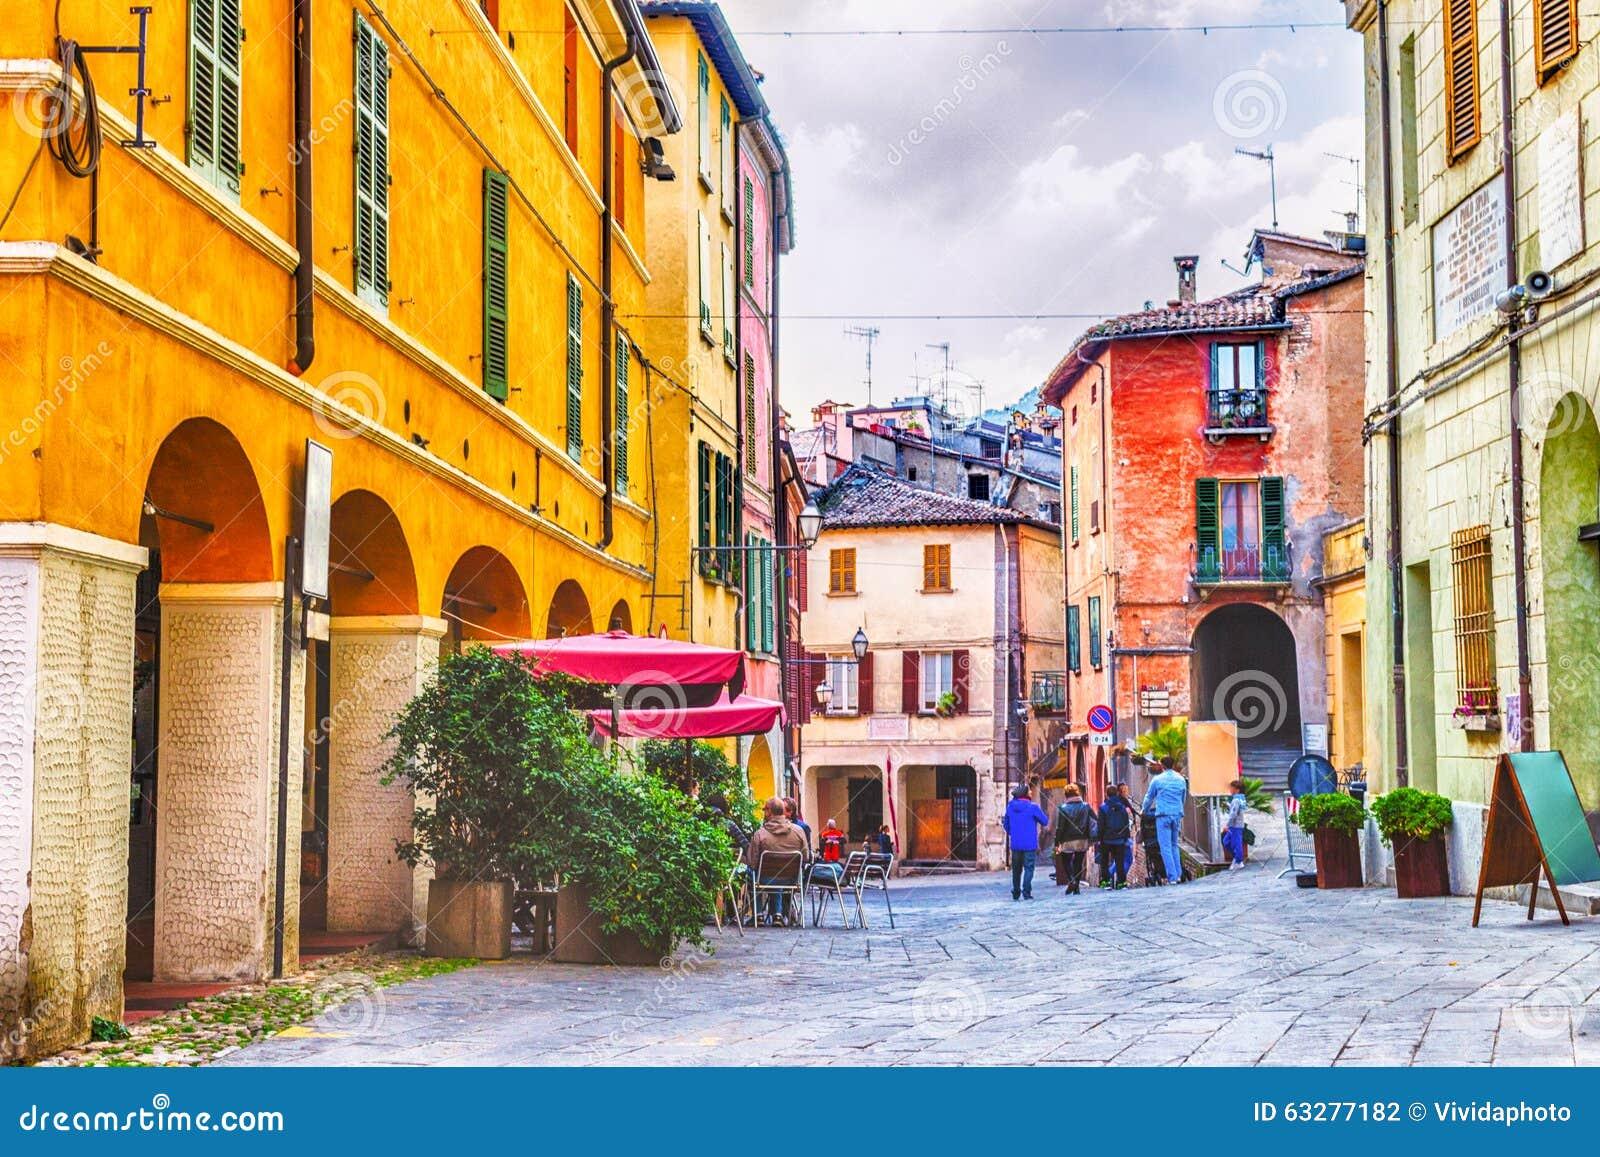 Square Under Donkeys Road In Brisighella Italy Stock Photo Image Of Donkeys Road 63277182